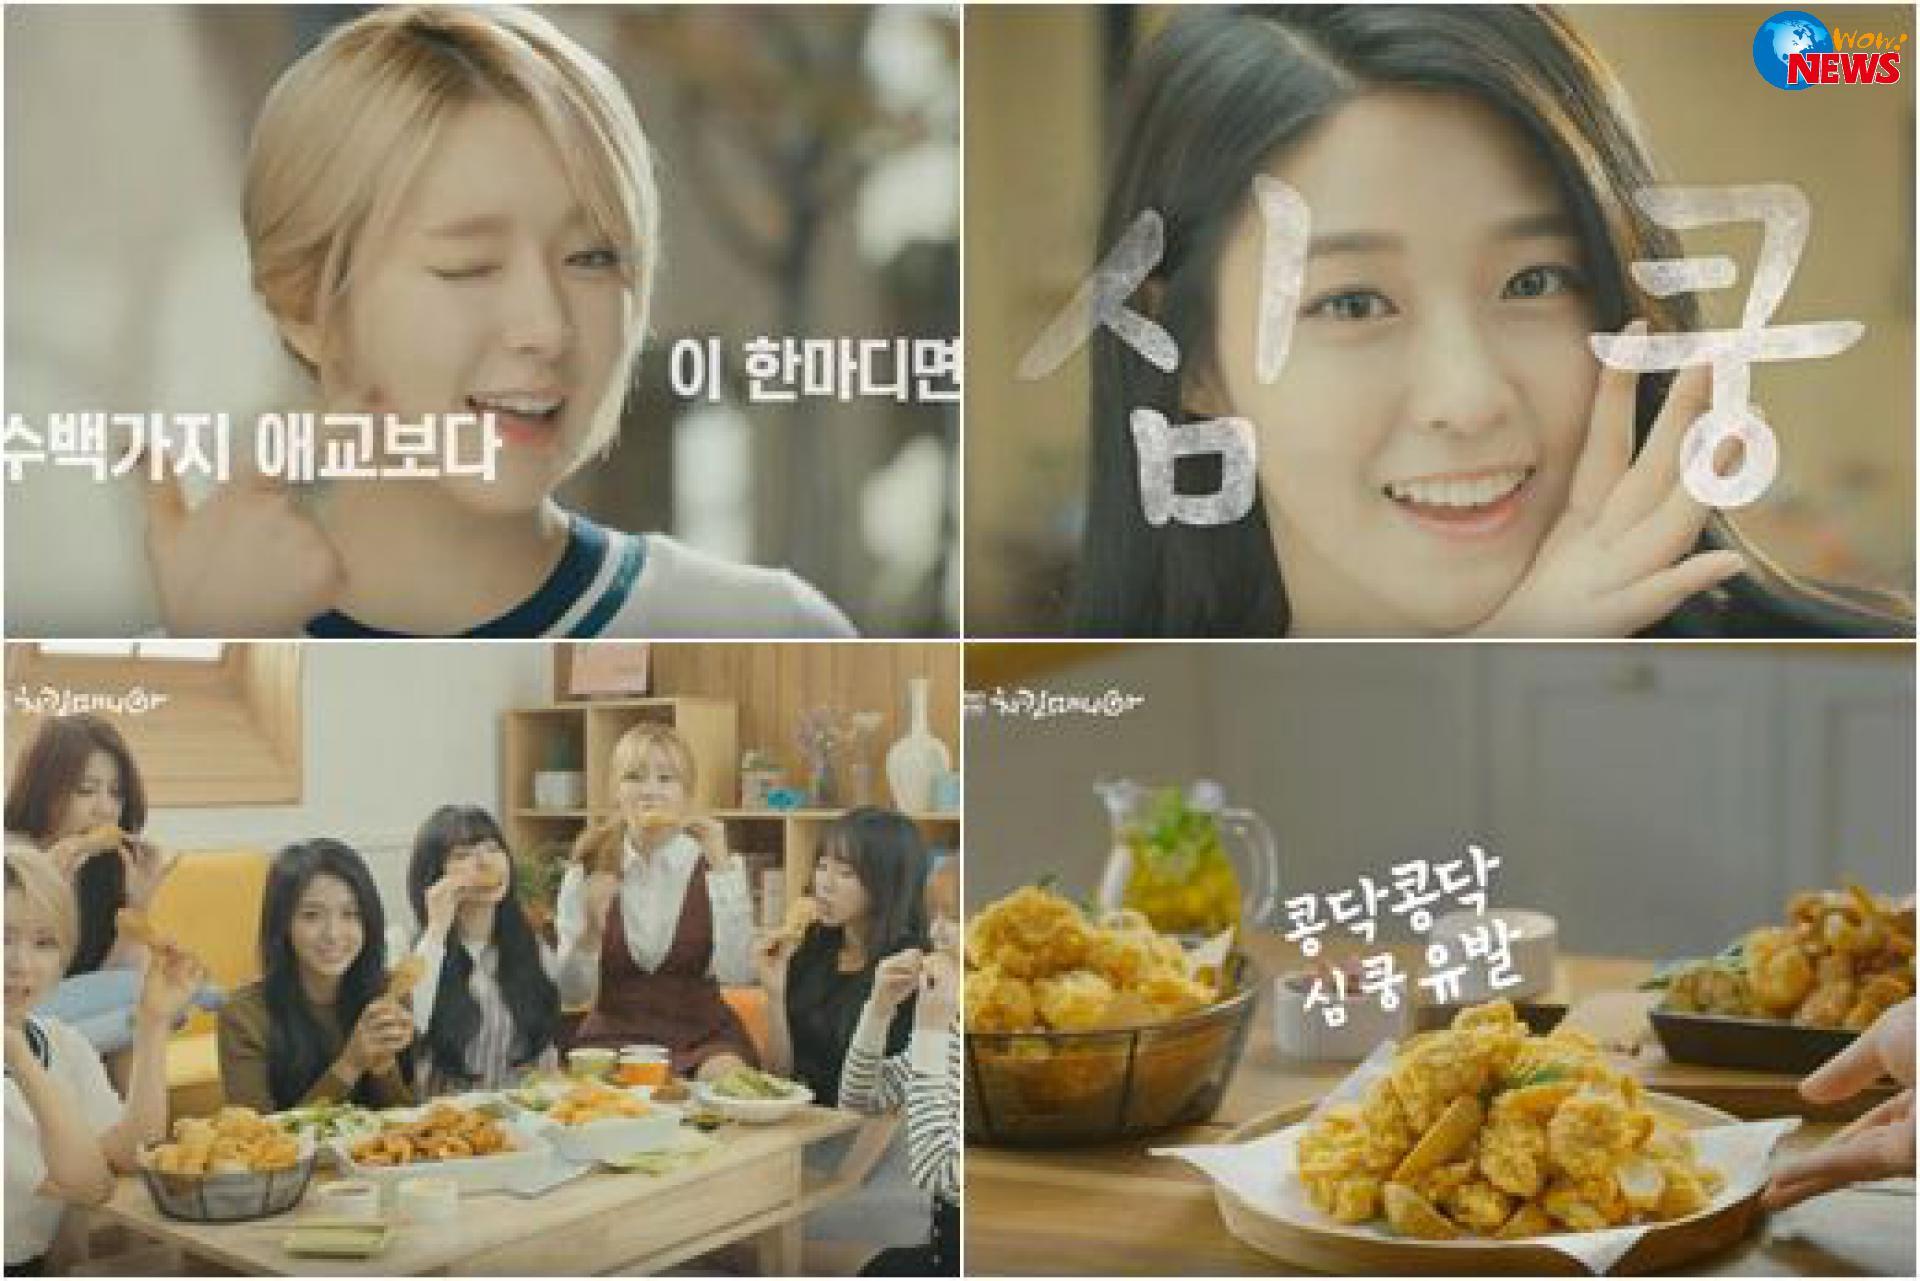 EXO防彈少年團AOA 再掀炸雞廣告狂潮_插圖